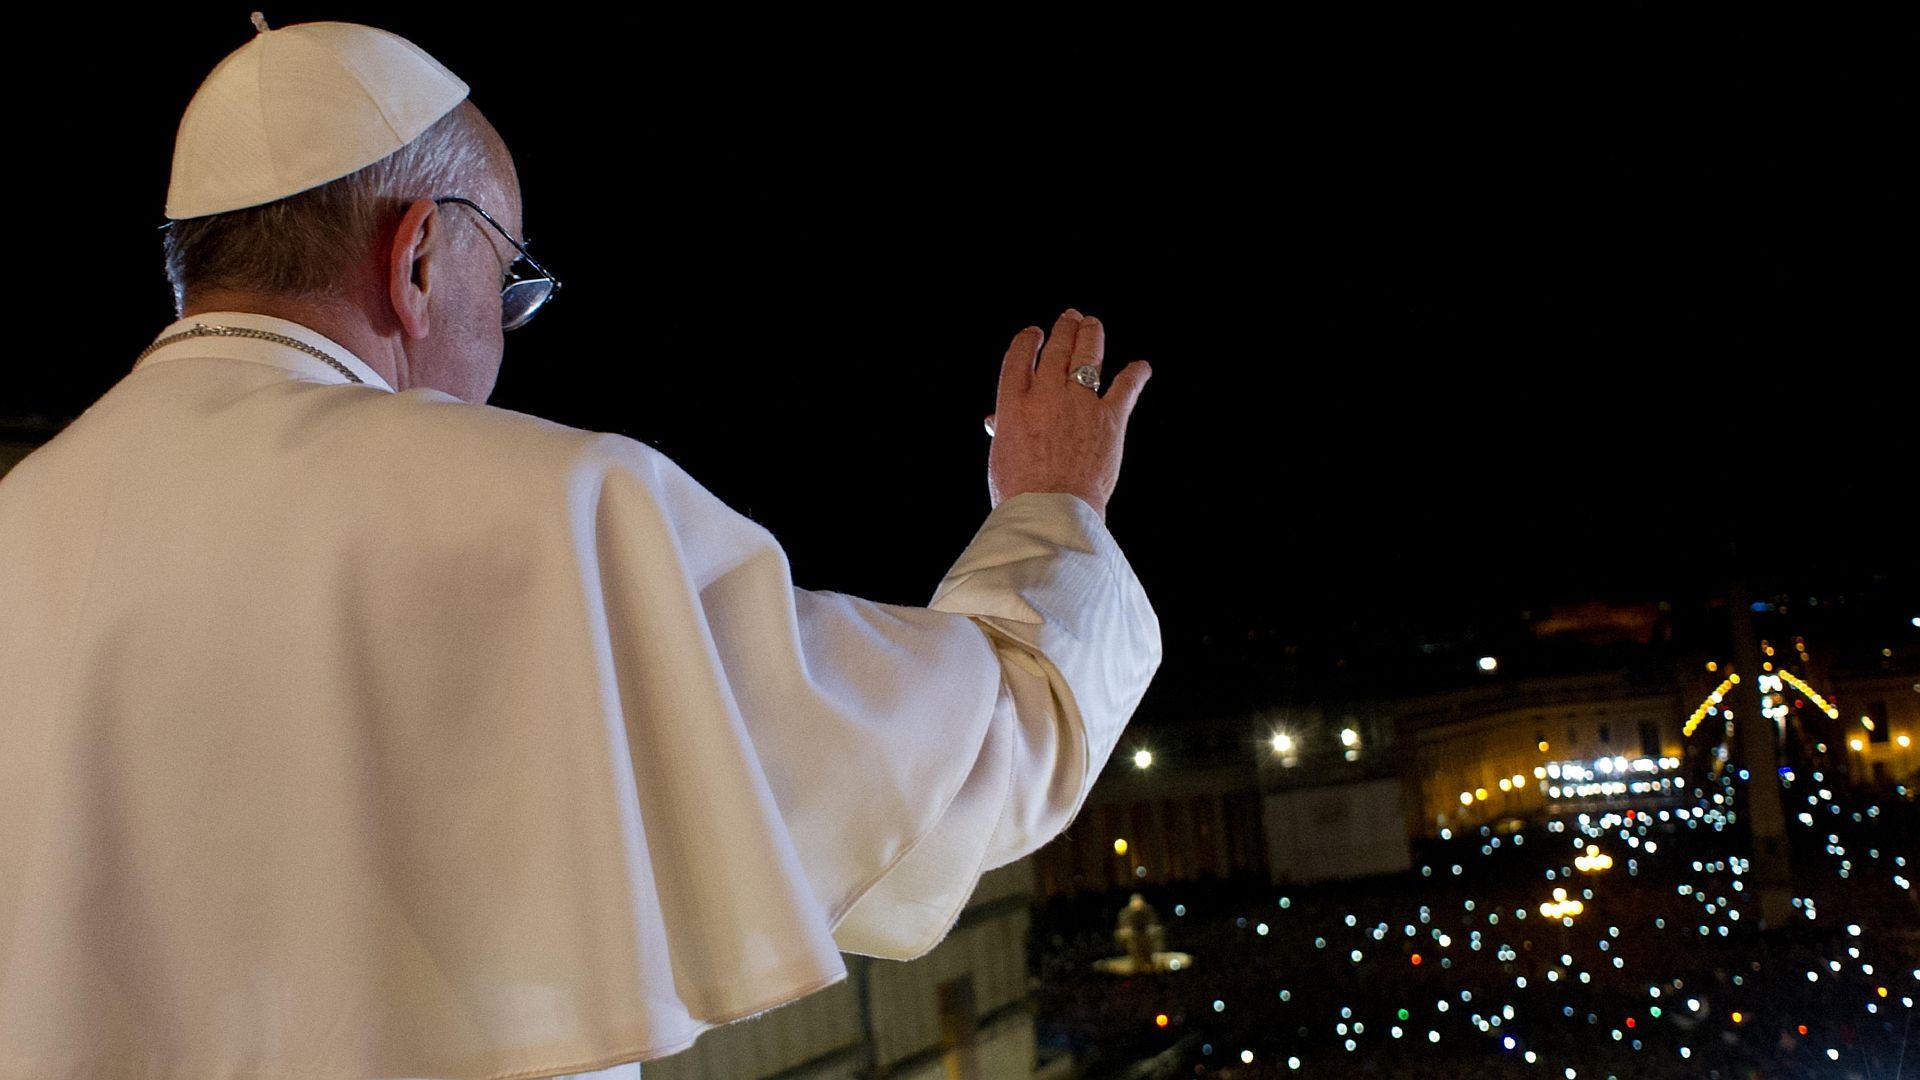 Habemus papam: A Ferenc név kötelez